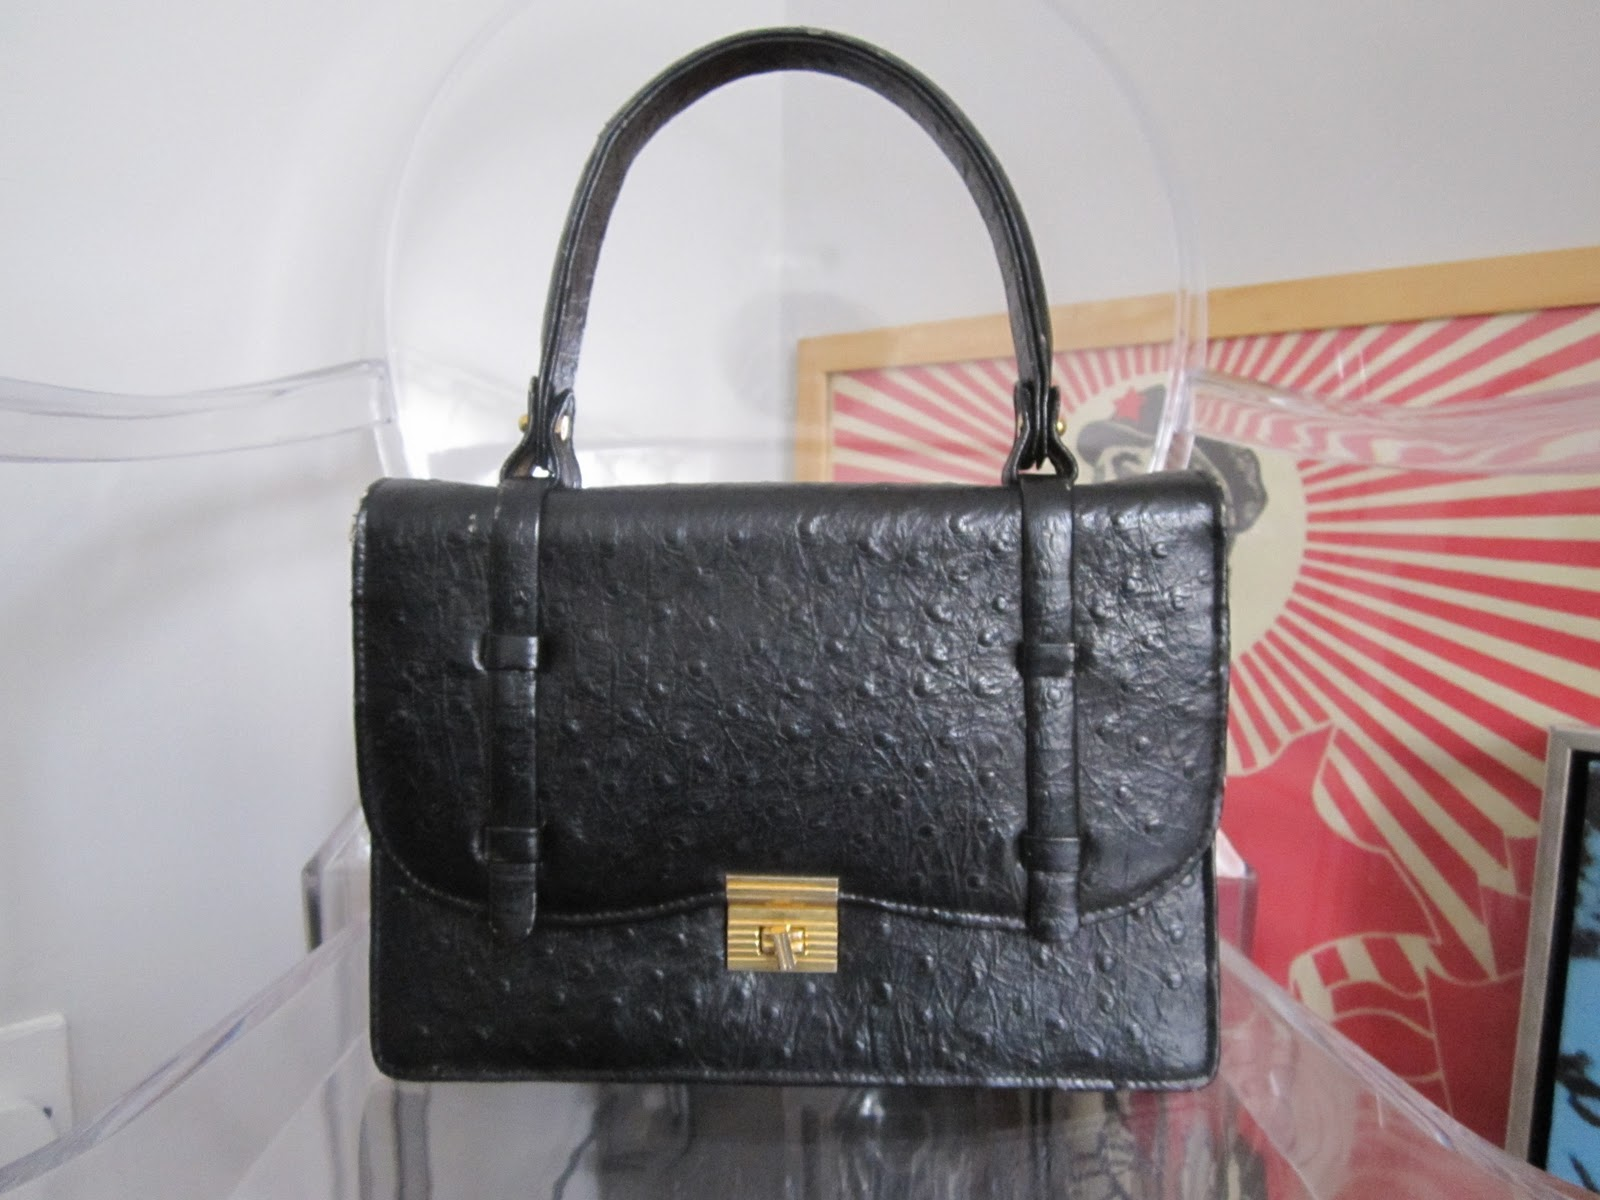 Arcadia Handbags Official Website